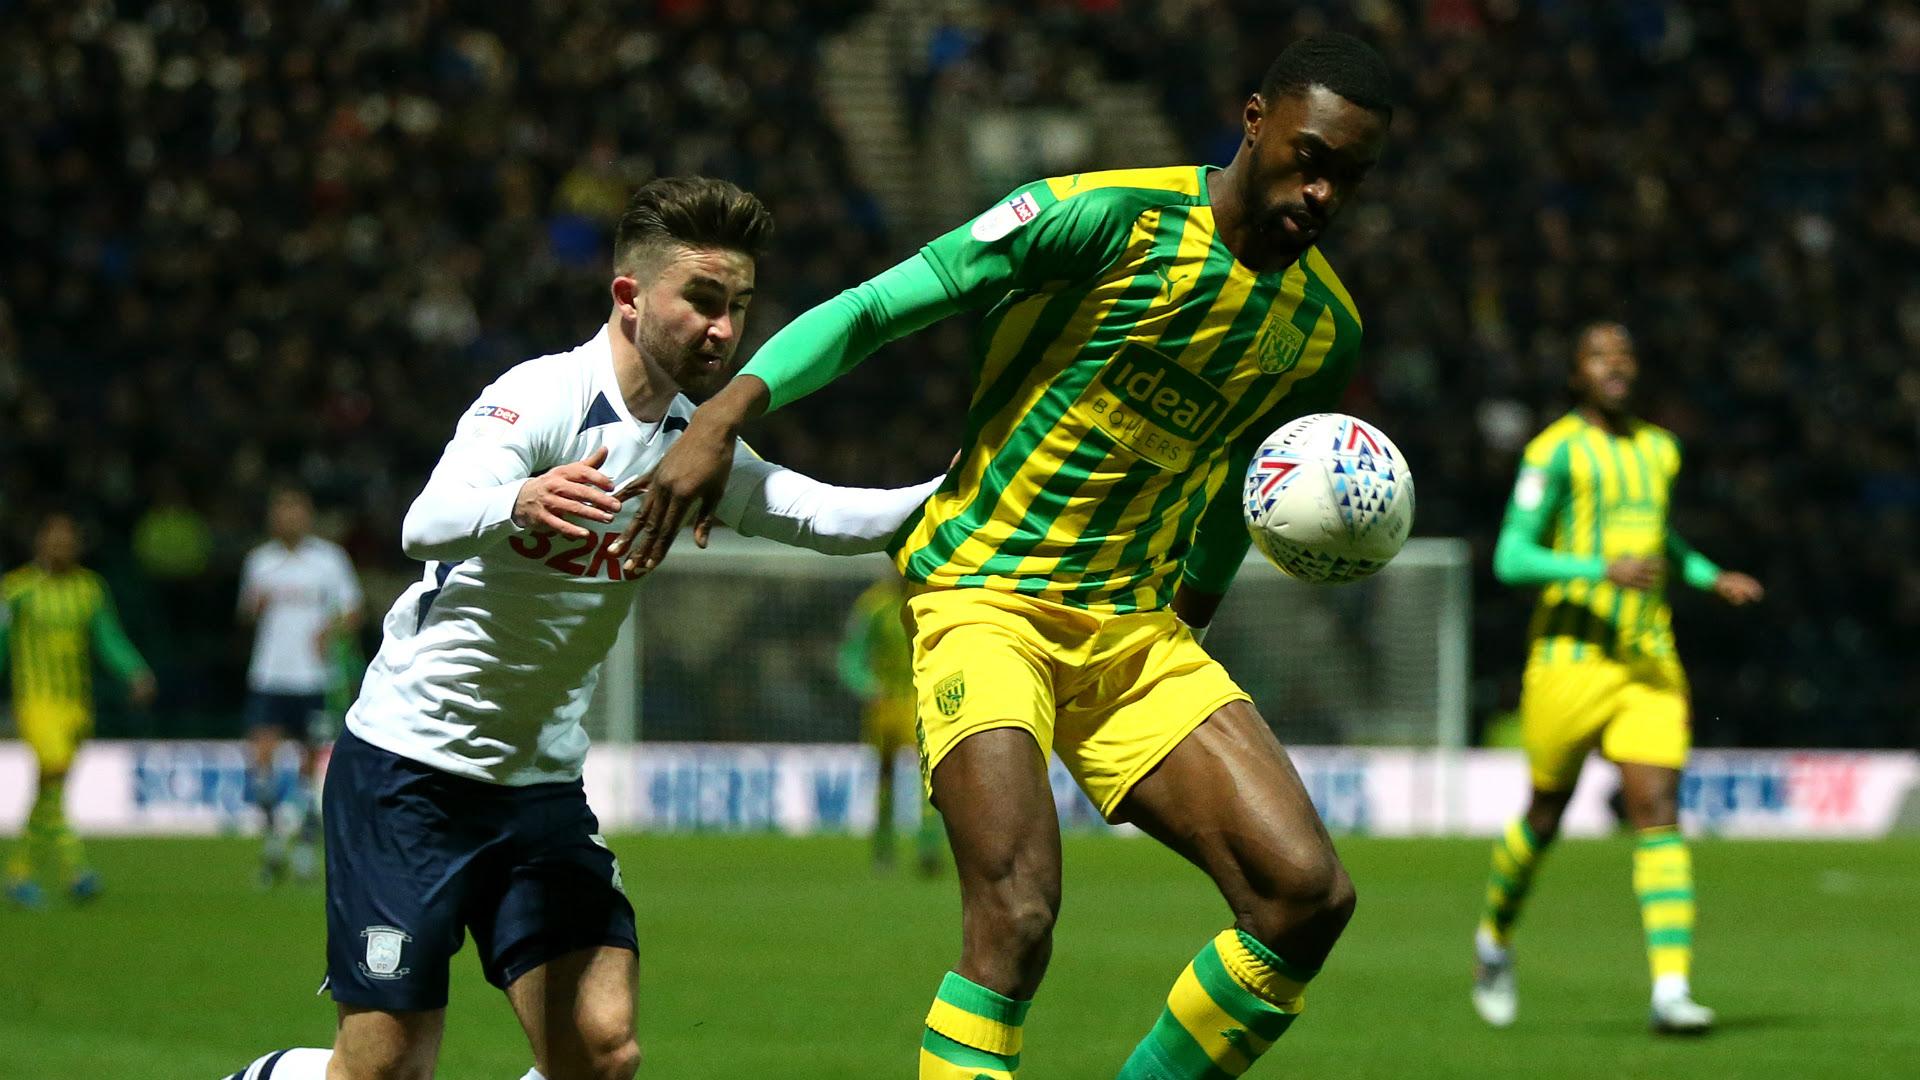 Ajayi: West Bromwich Albion have 'belief' to avoid Premier League relegation